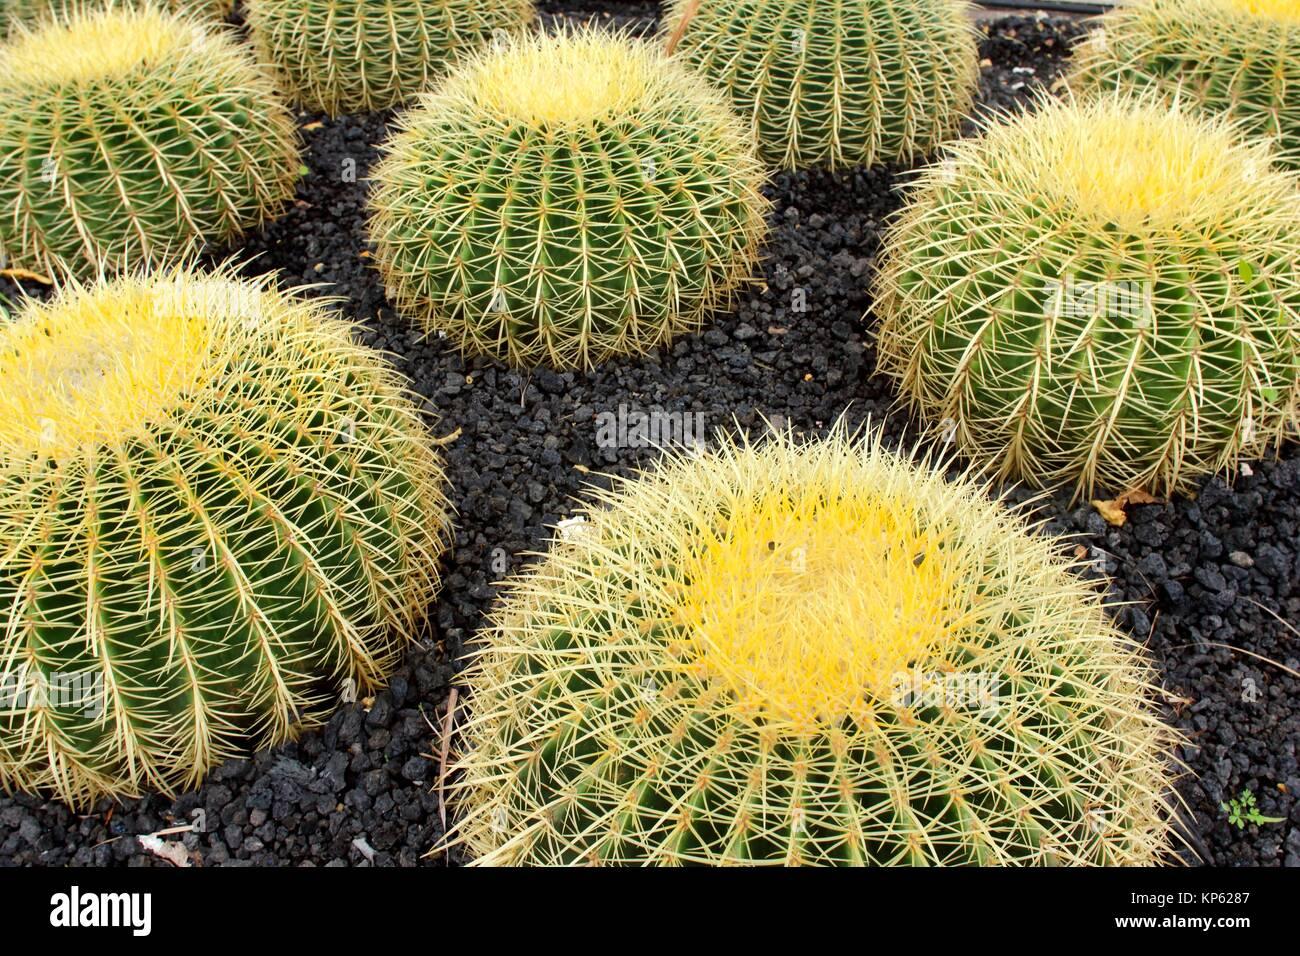 Teneriffa, Kanarische Inseln, Spanien Stockfoto